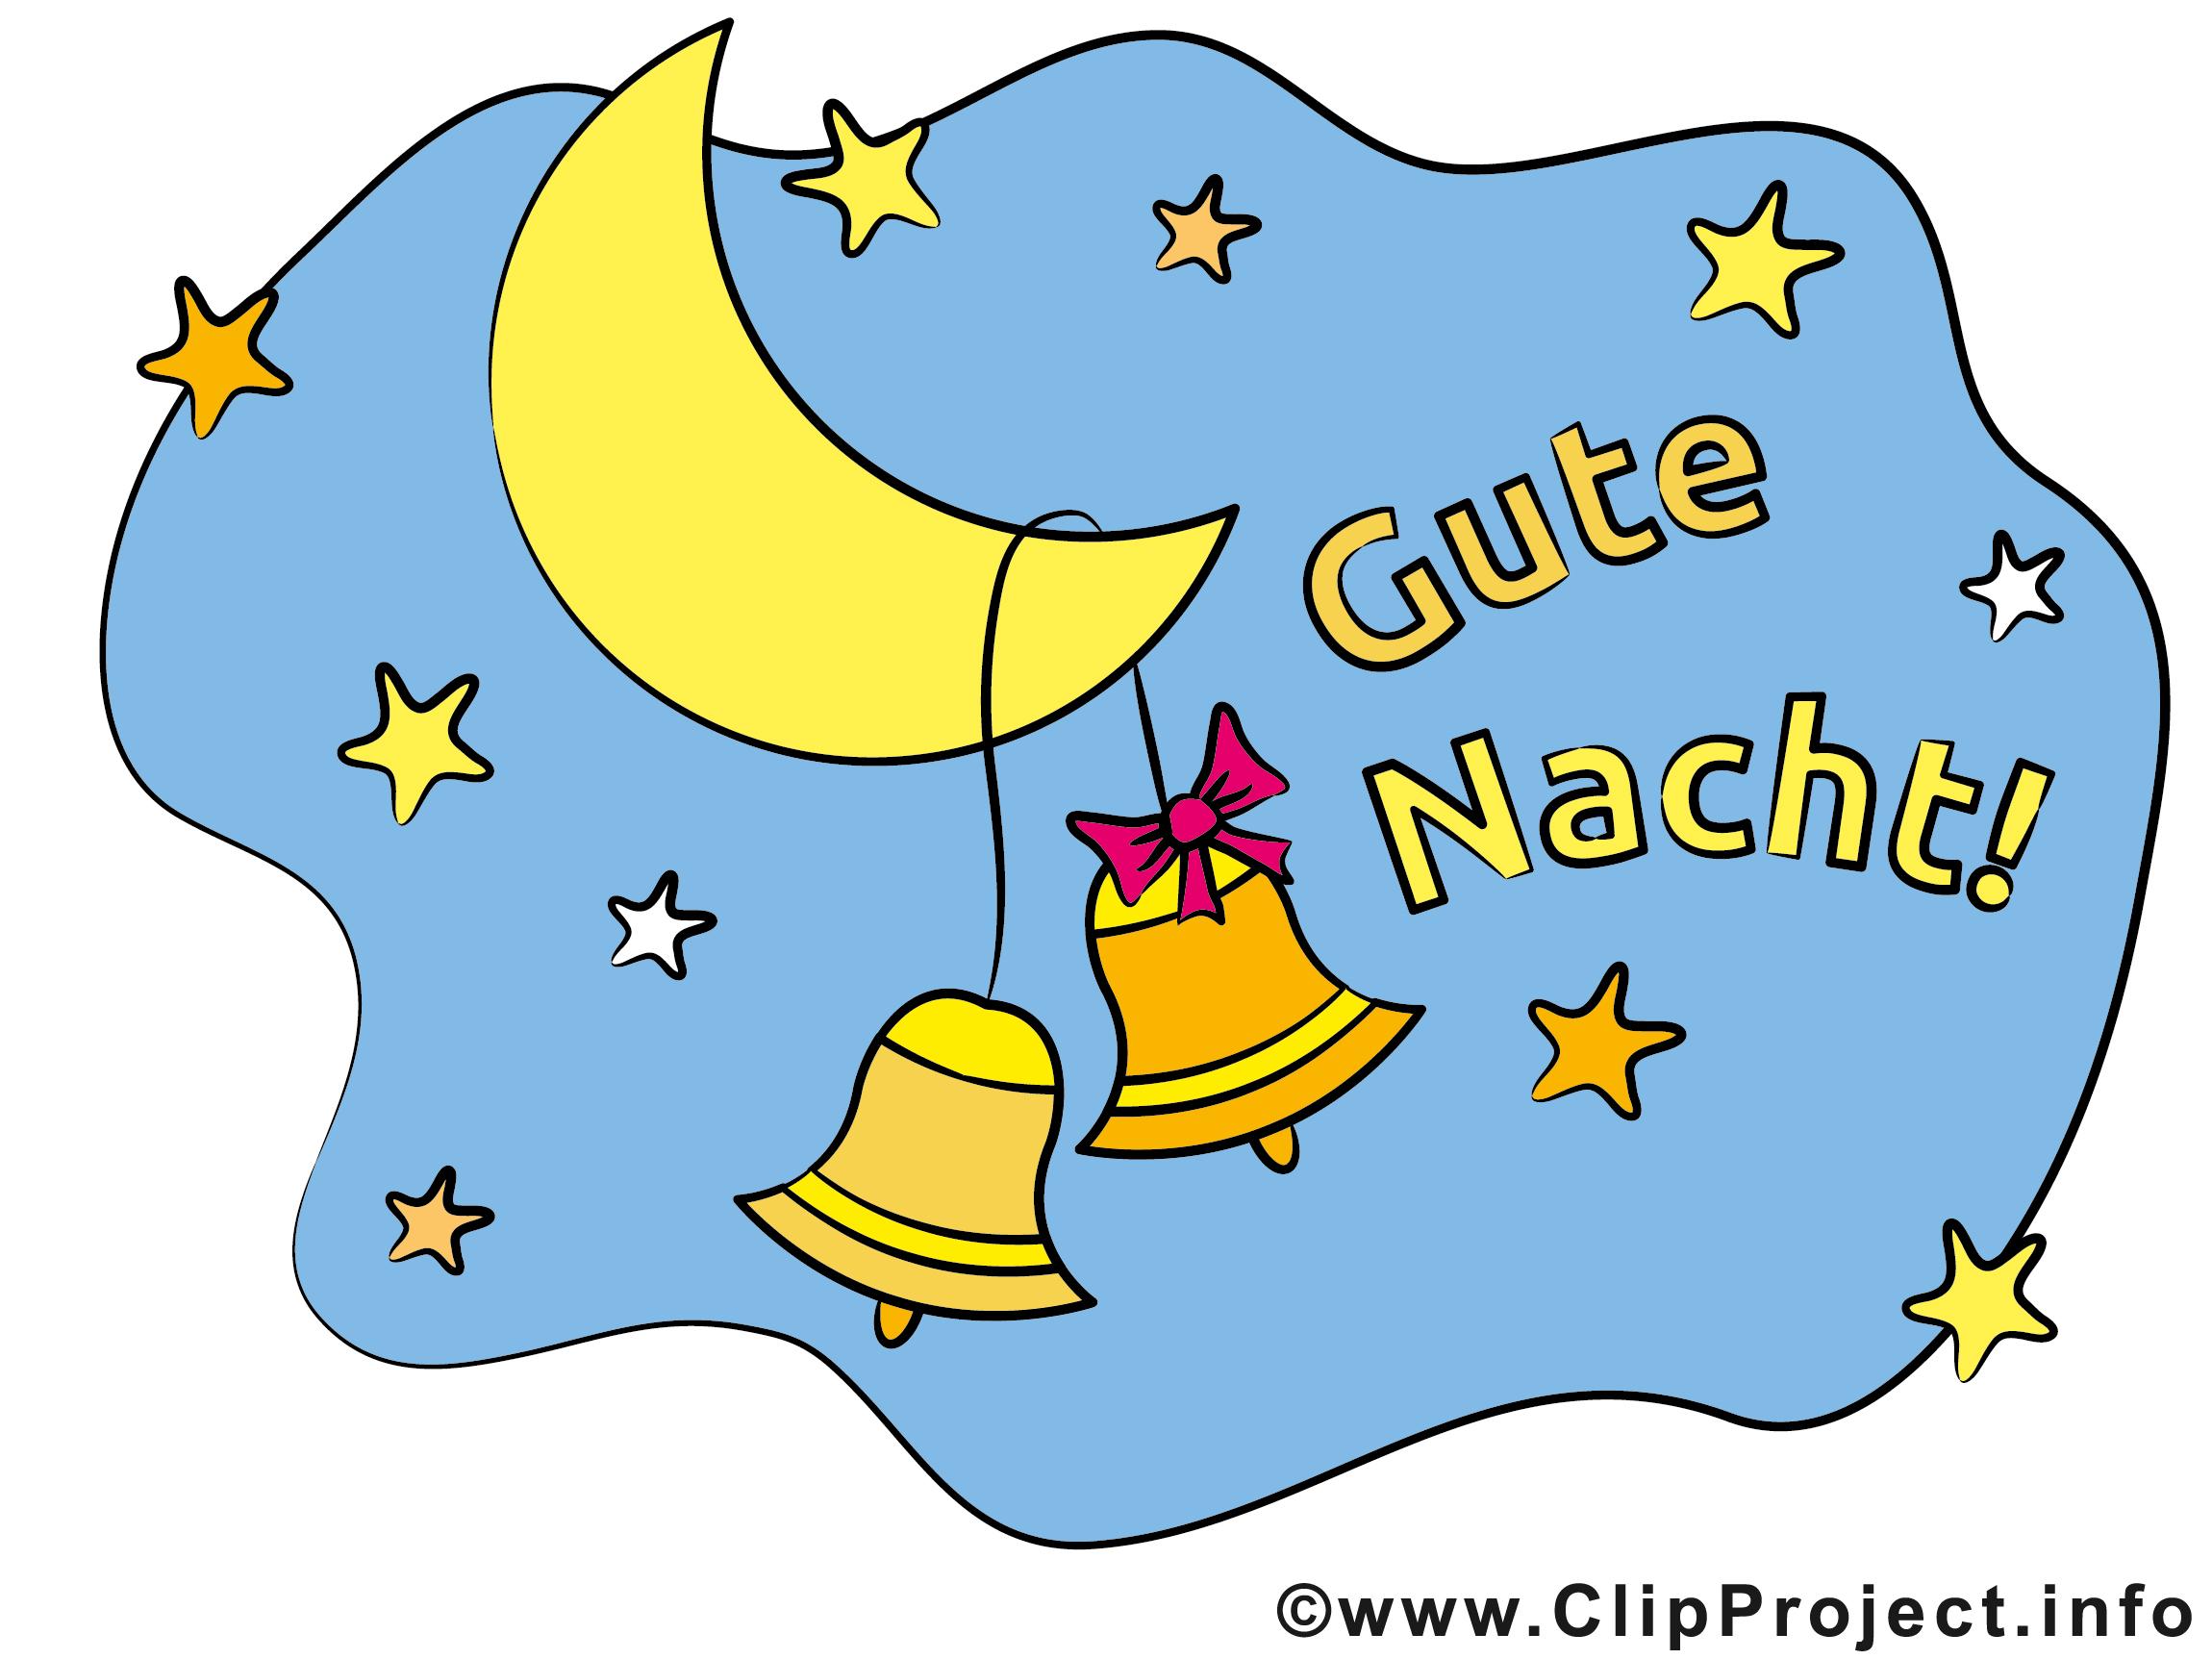 Gute freunde clipart jpg black and white library Gute Nacht Bilder, Cliparts, Cartoons, Grafiken, Illustrationen ... jpg black and white library